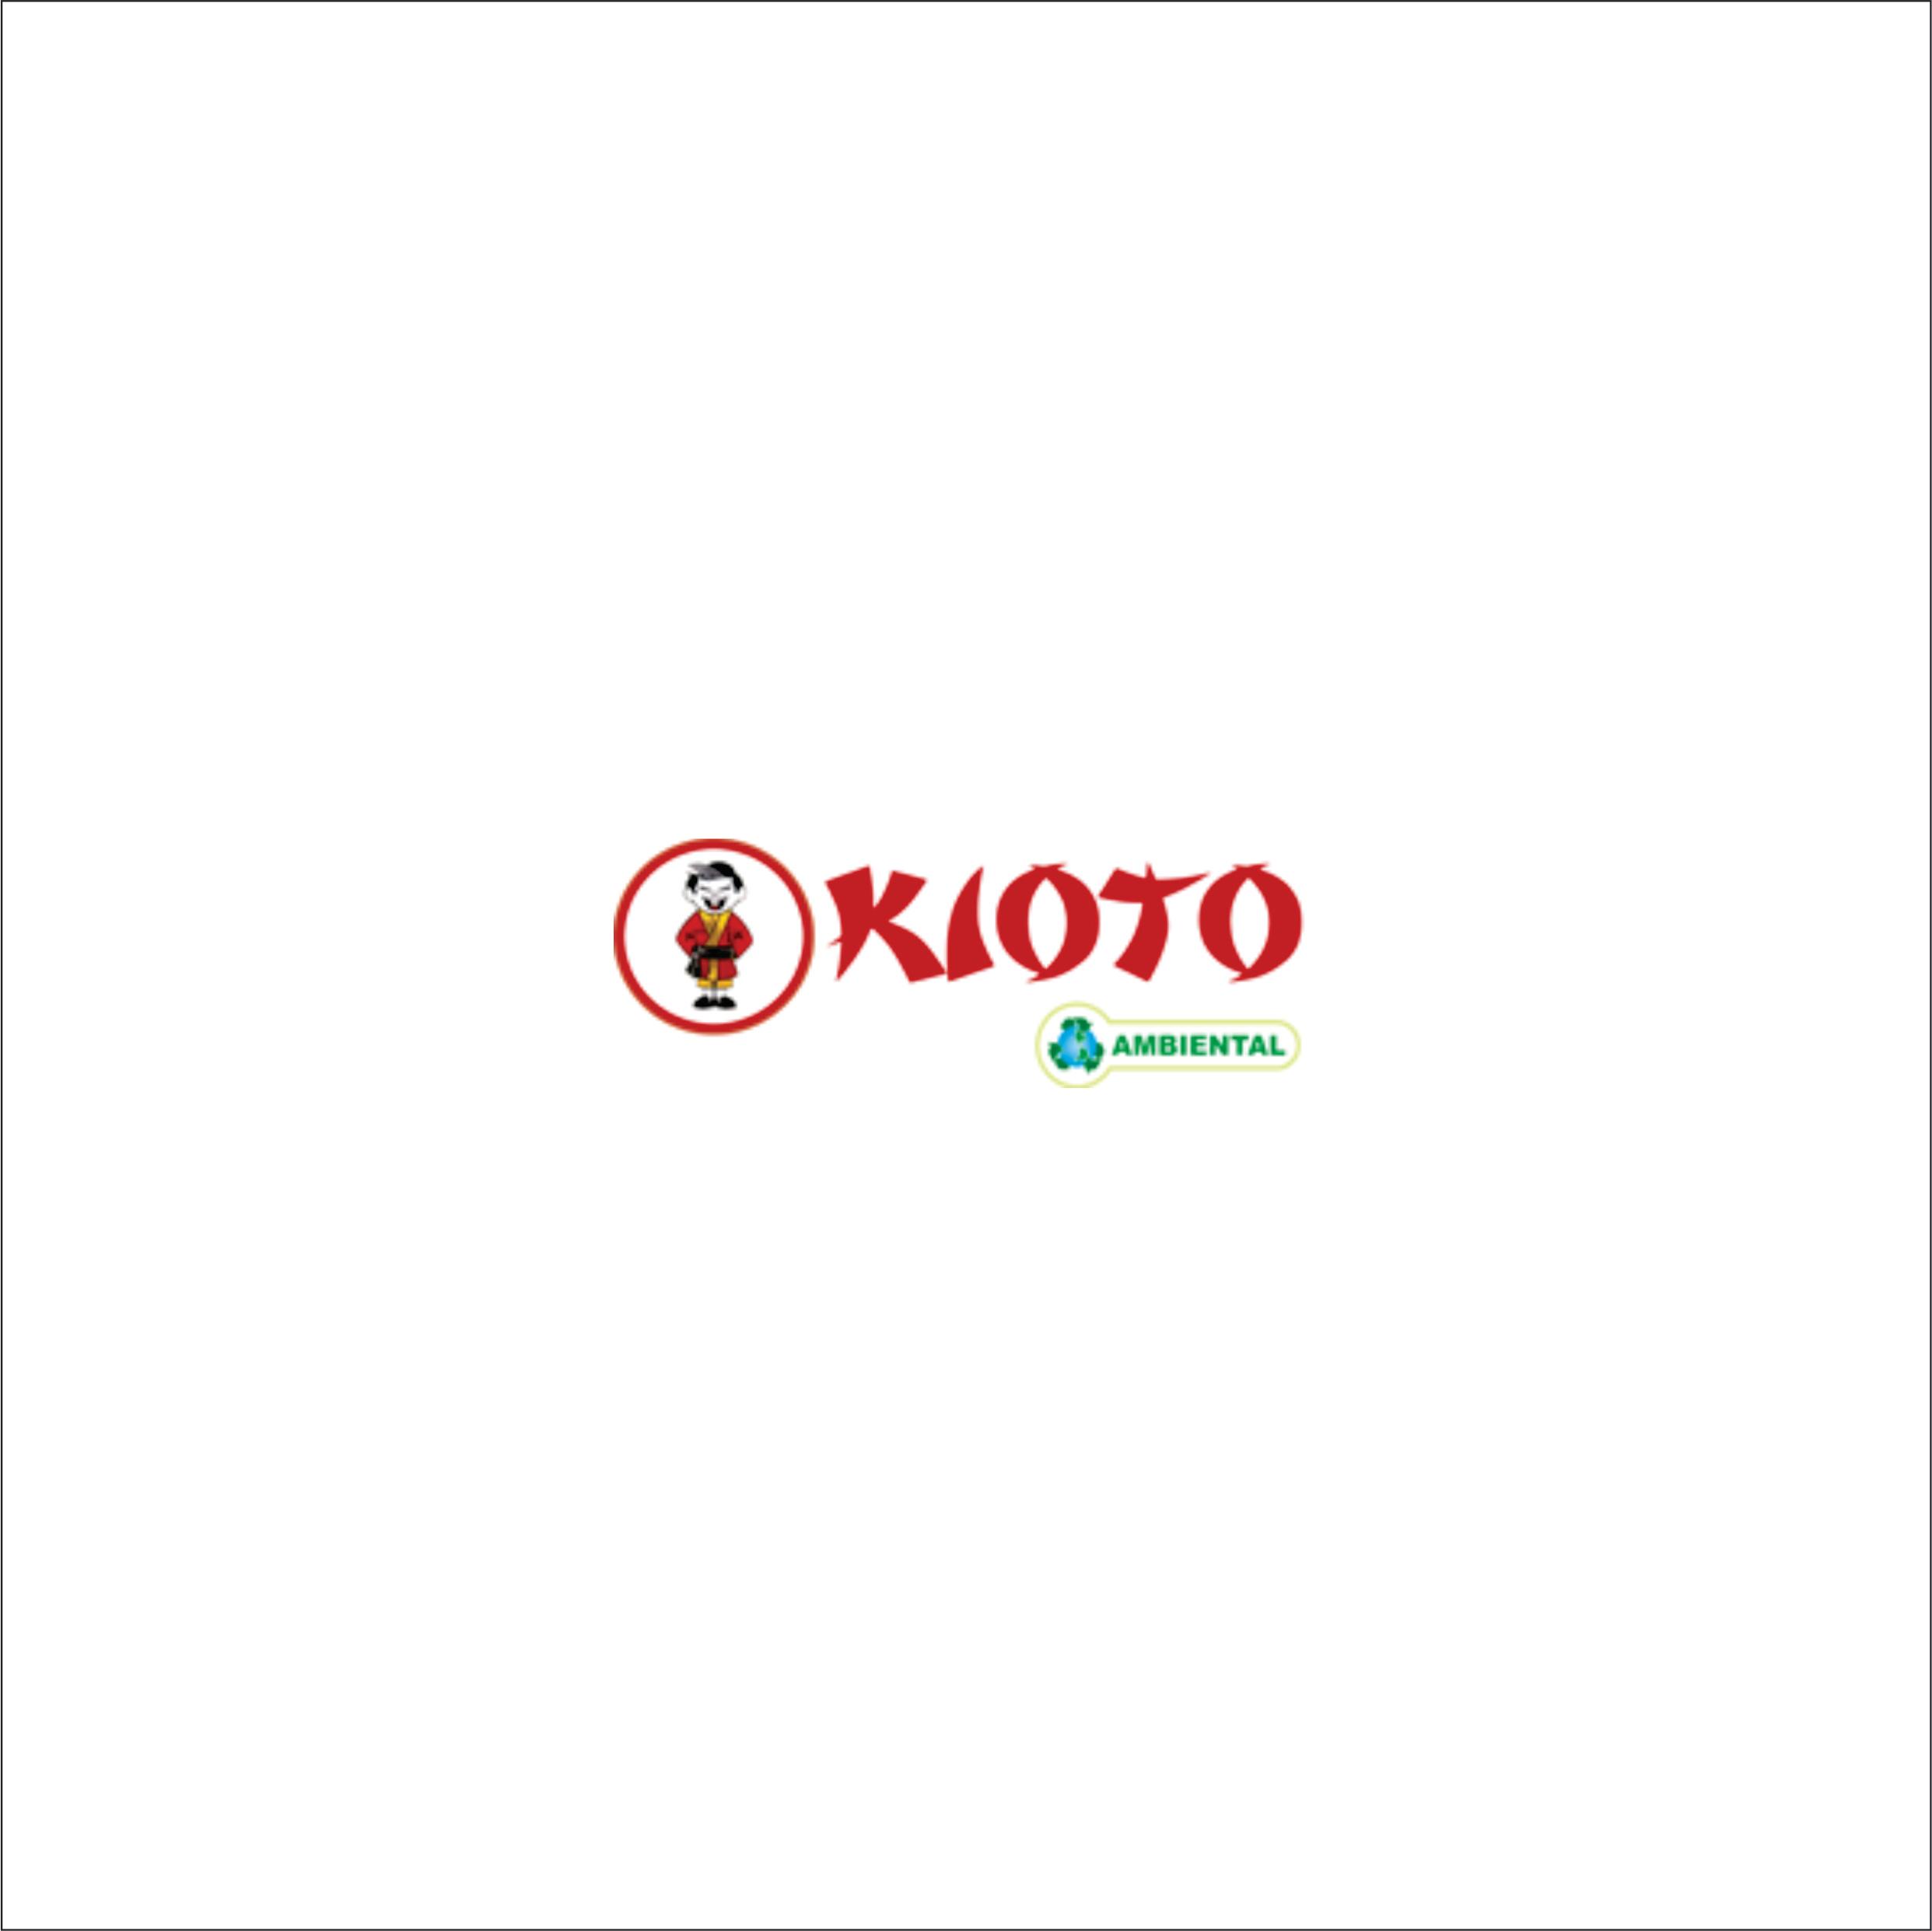 Kioto Ambiental